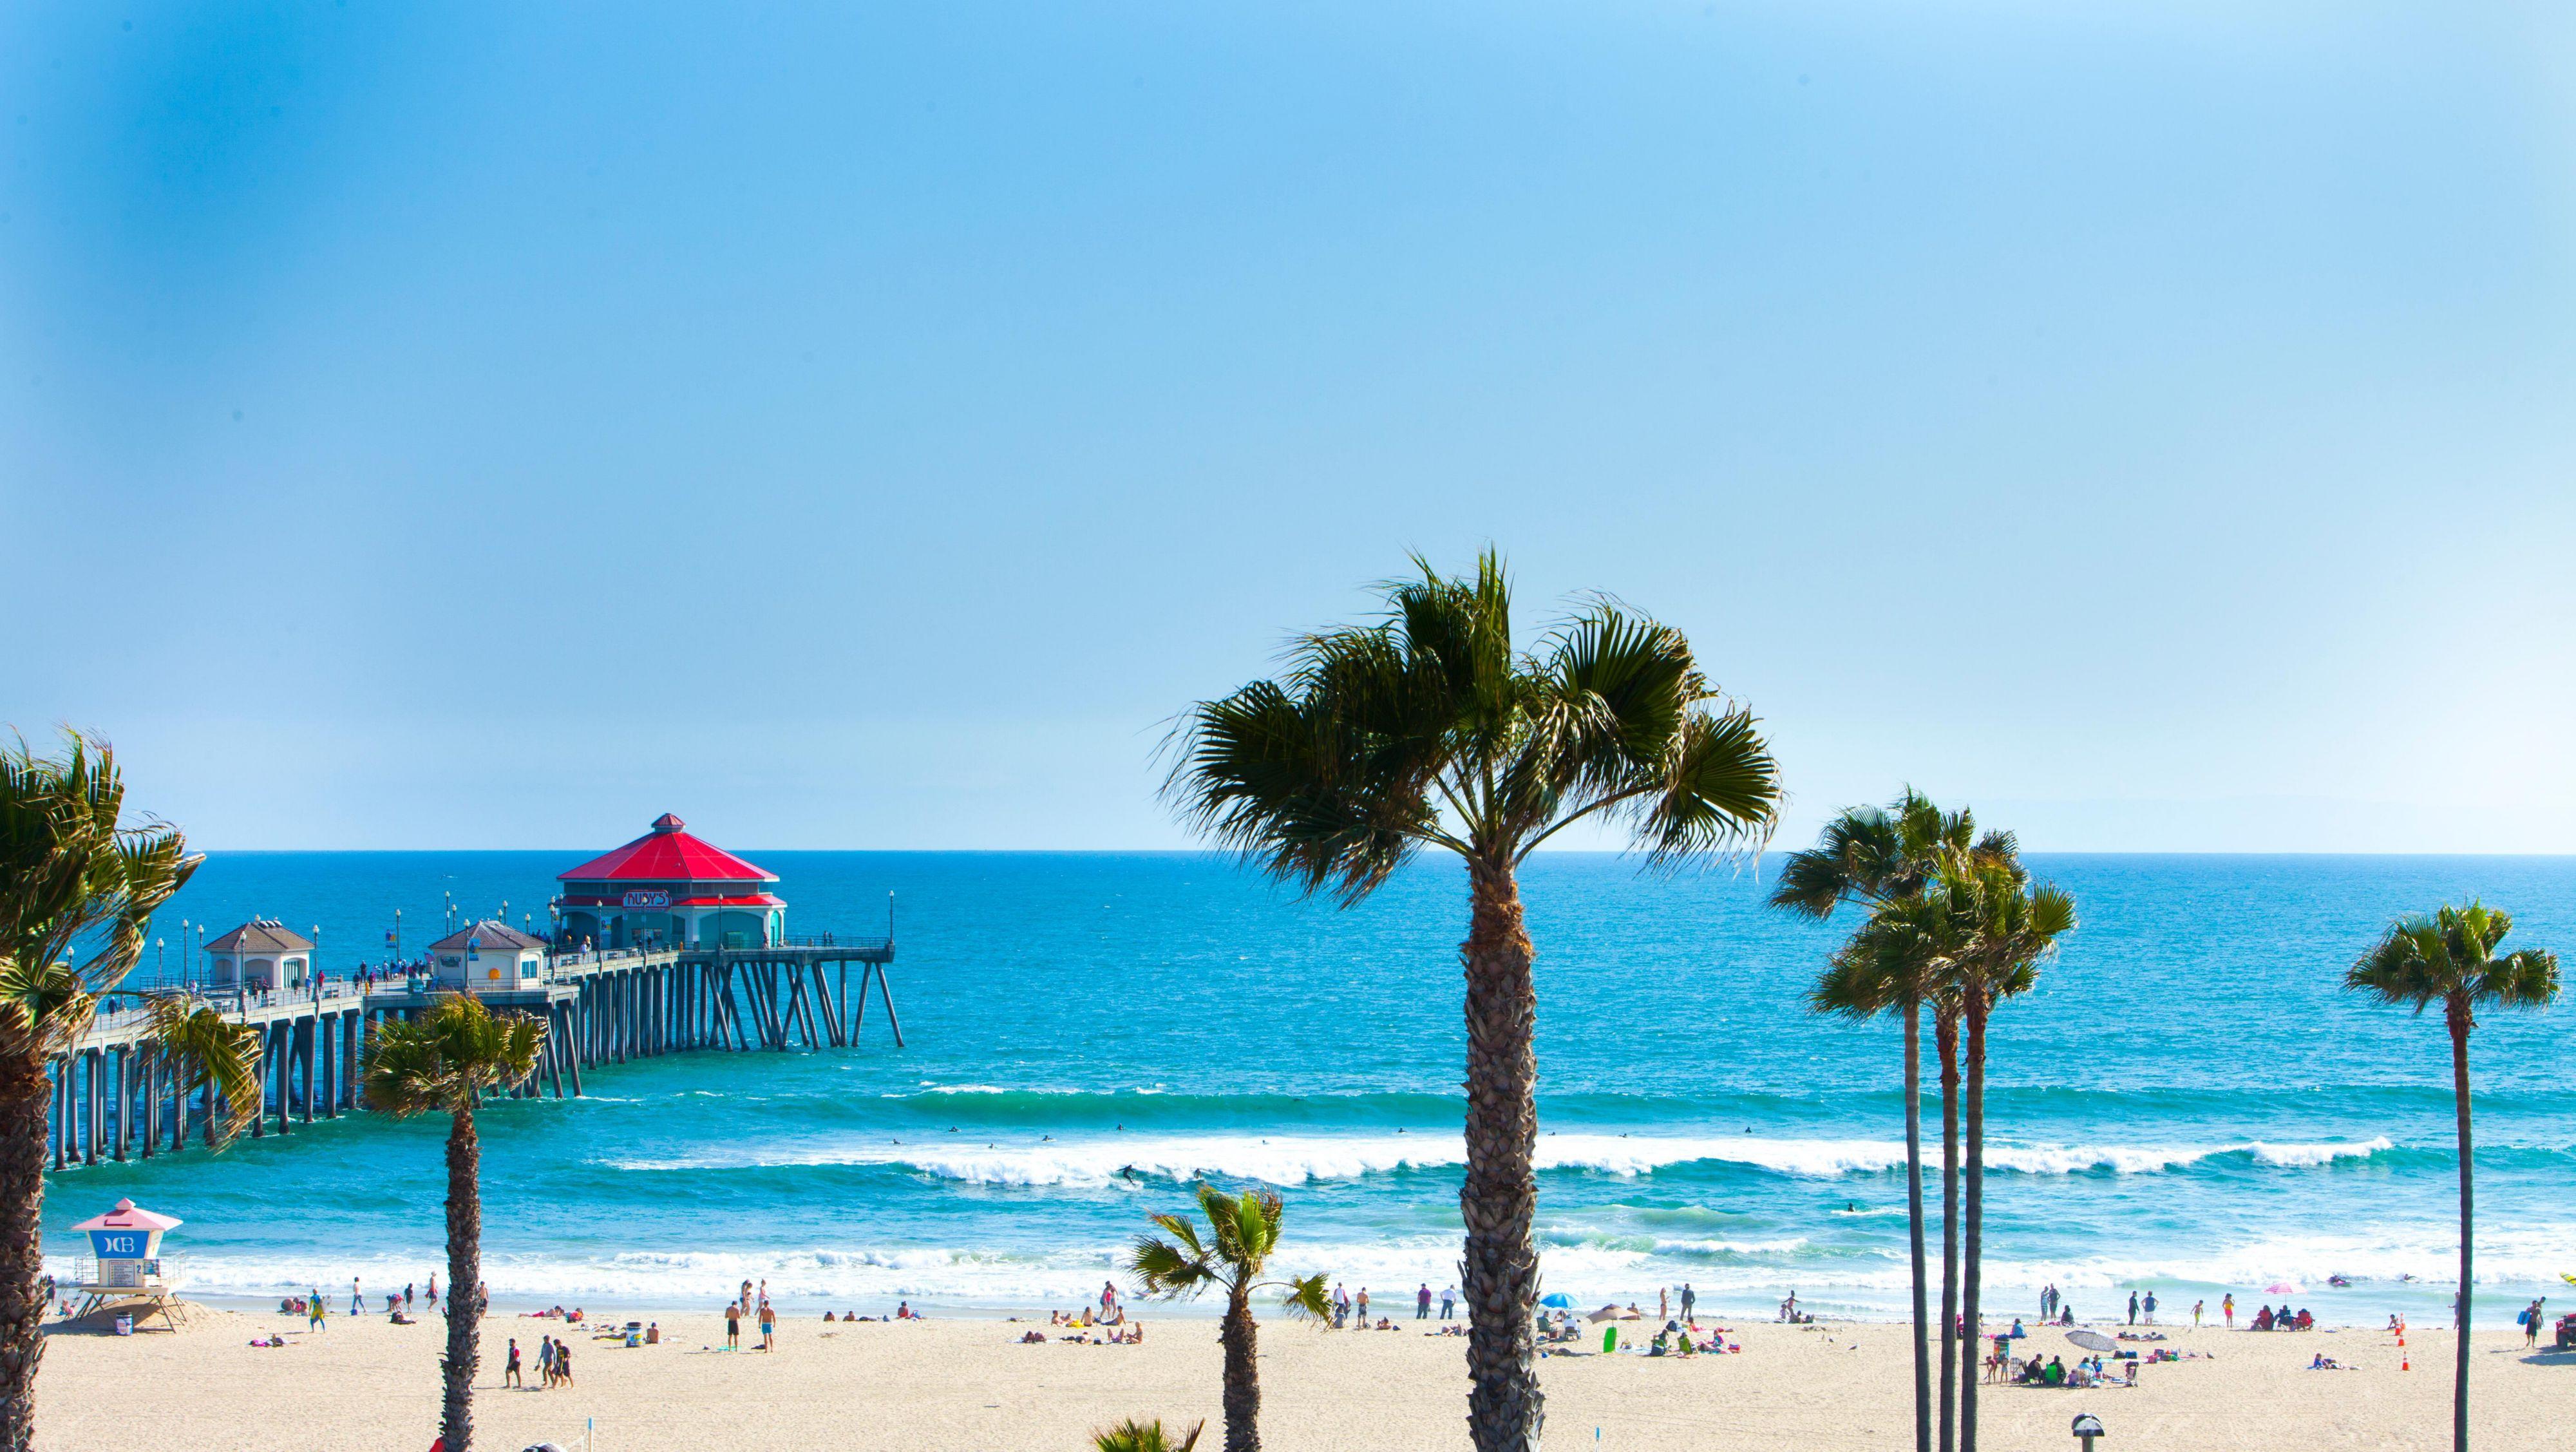 Hightlightsimages Surfing Huntington Beach